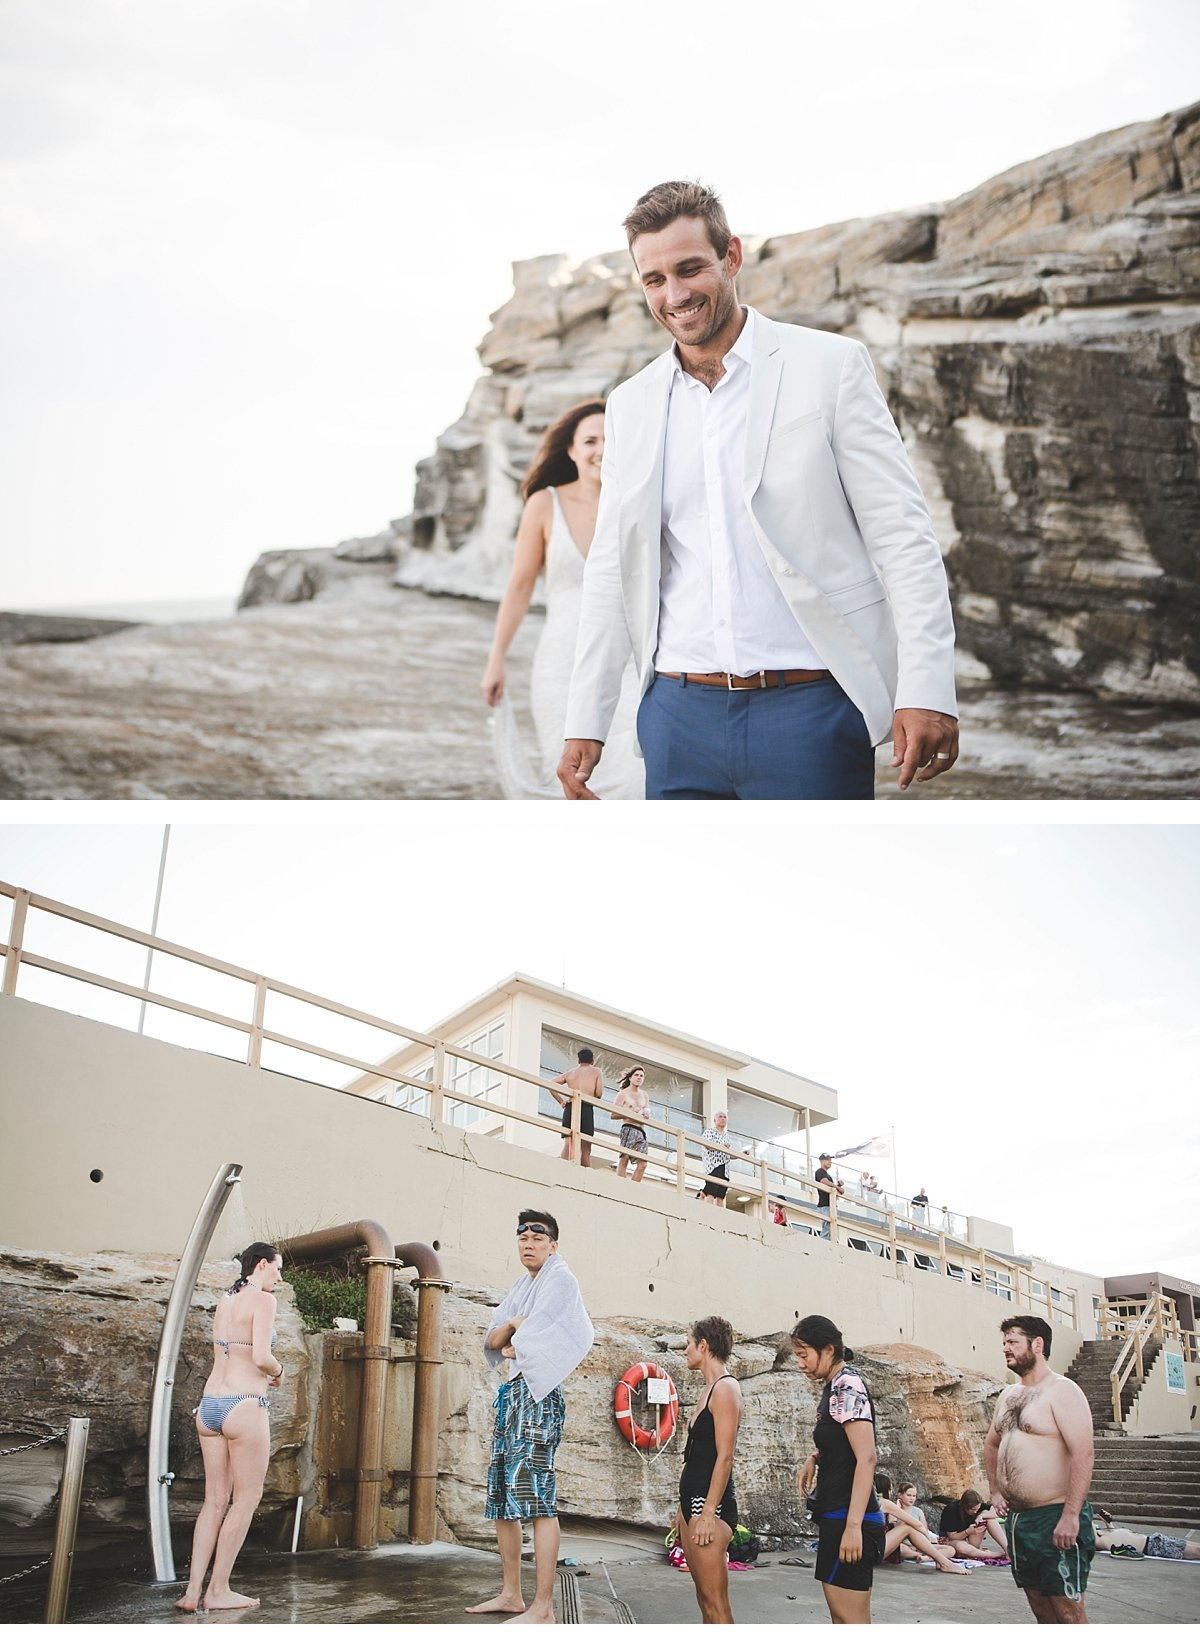 Wagga Wagga Wedding Photographer Sydney Wedding Bondi Beach Australian Wedding Photographer_0419